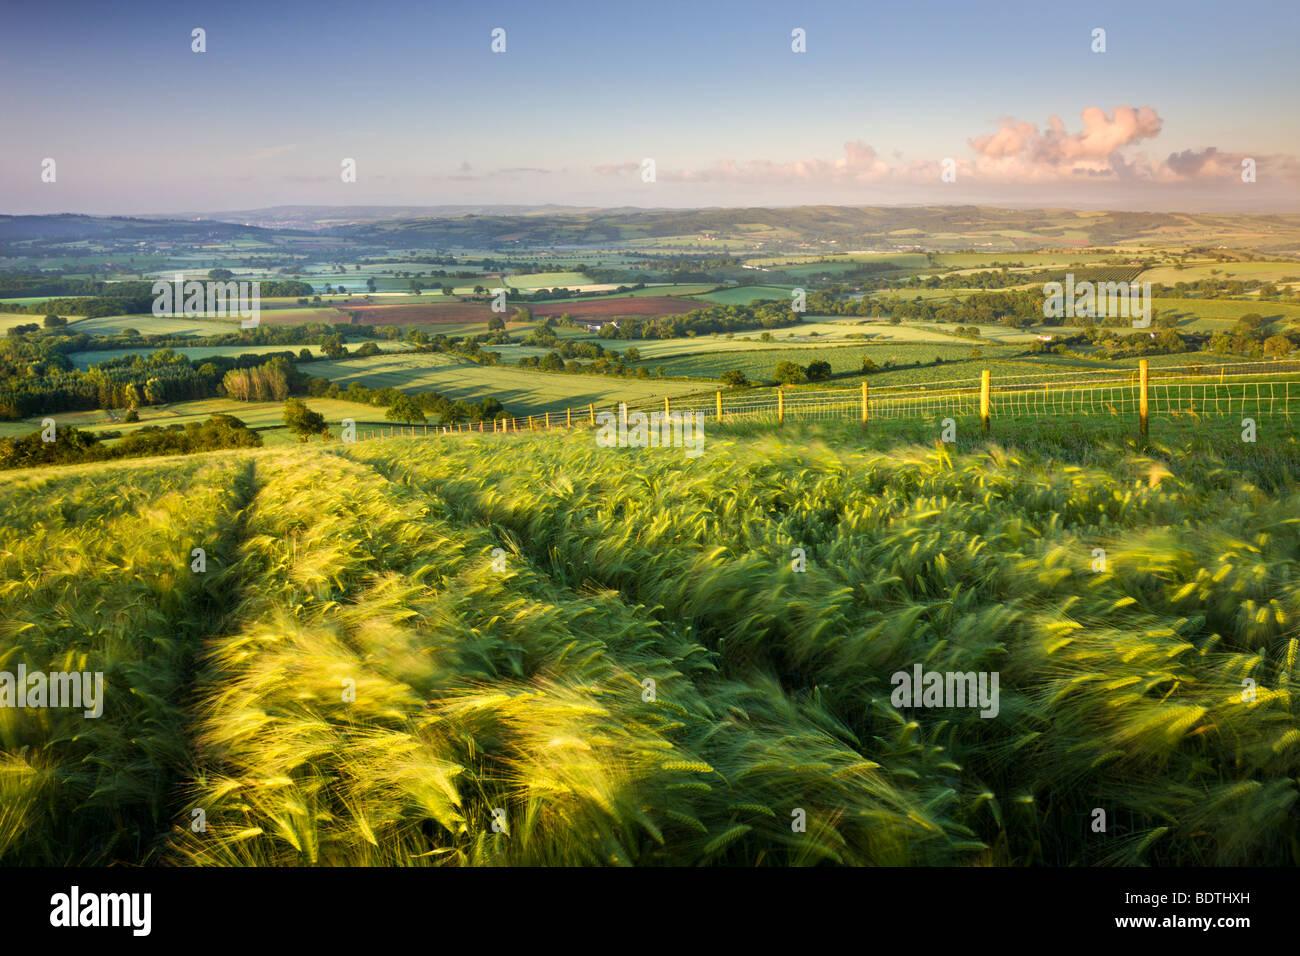 Golden ripened barley growing in a hilltop field in rural Devon, England. Summer (June) 2009 - Stock Image